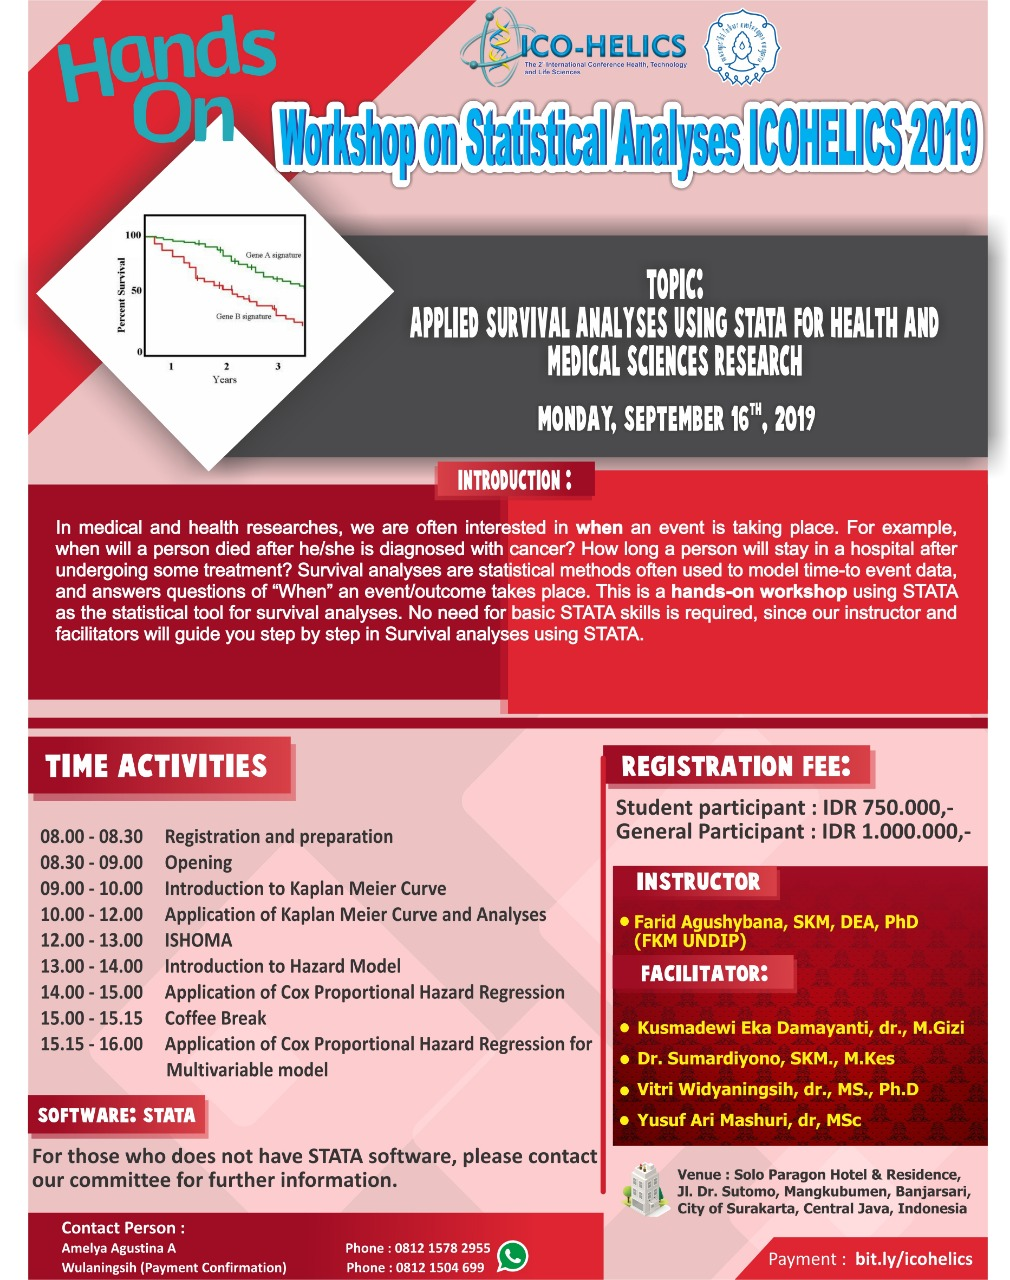 Workshop on Statistical Analysis ICOHELICS 2019